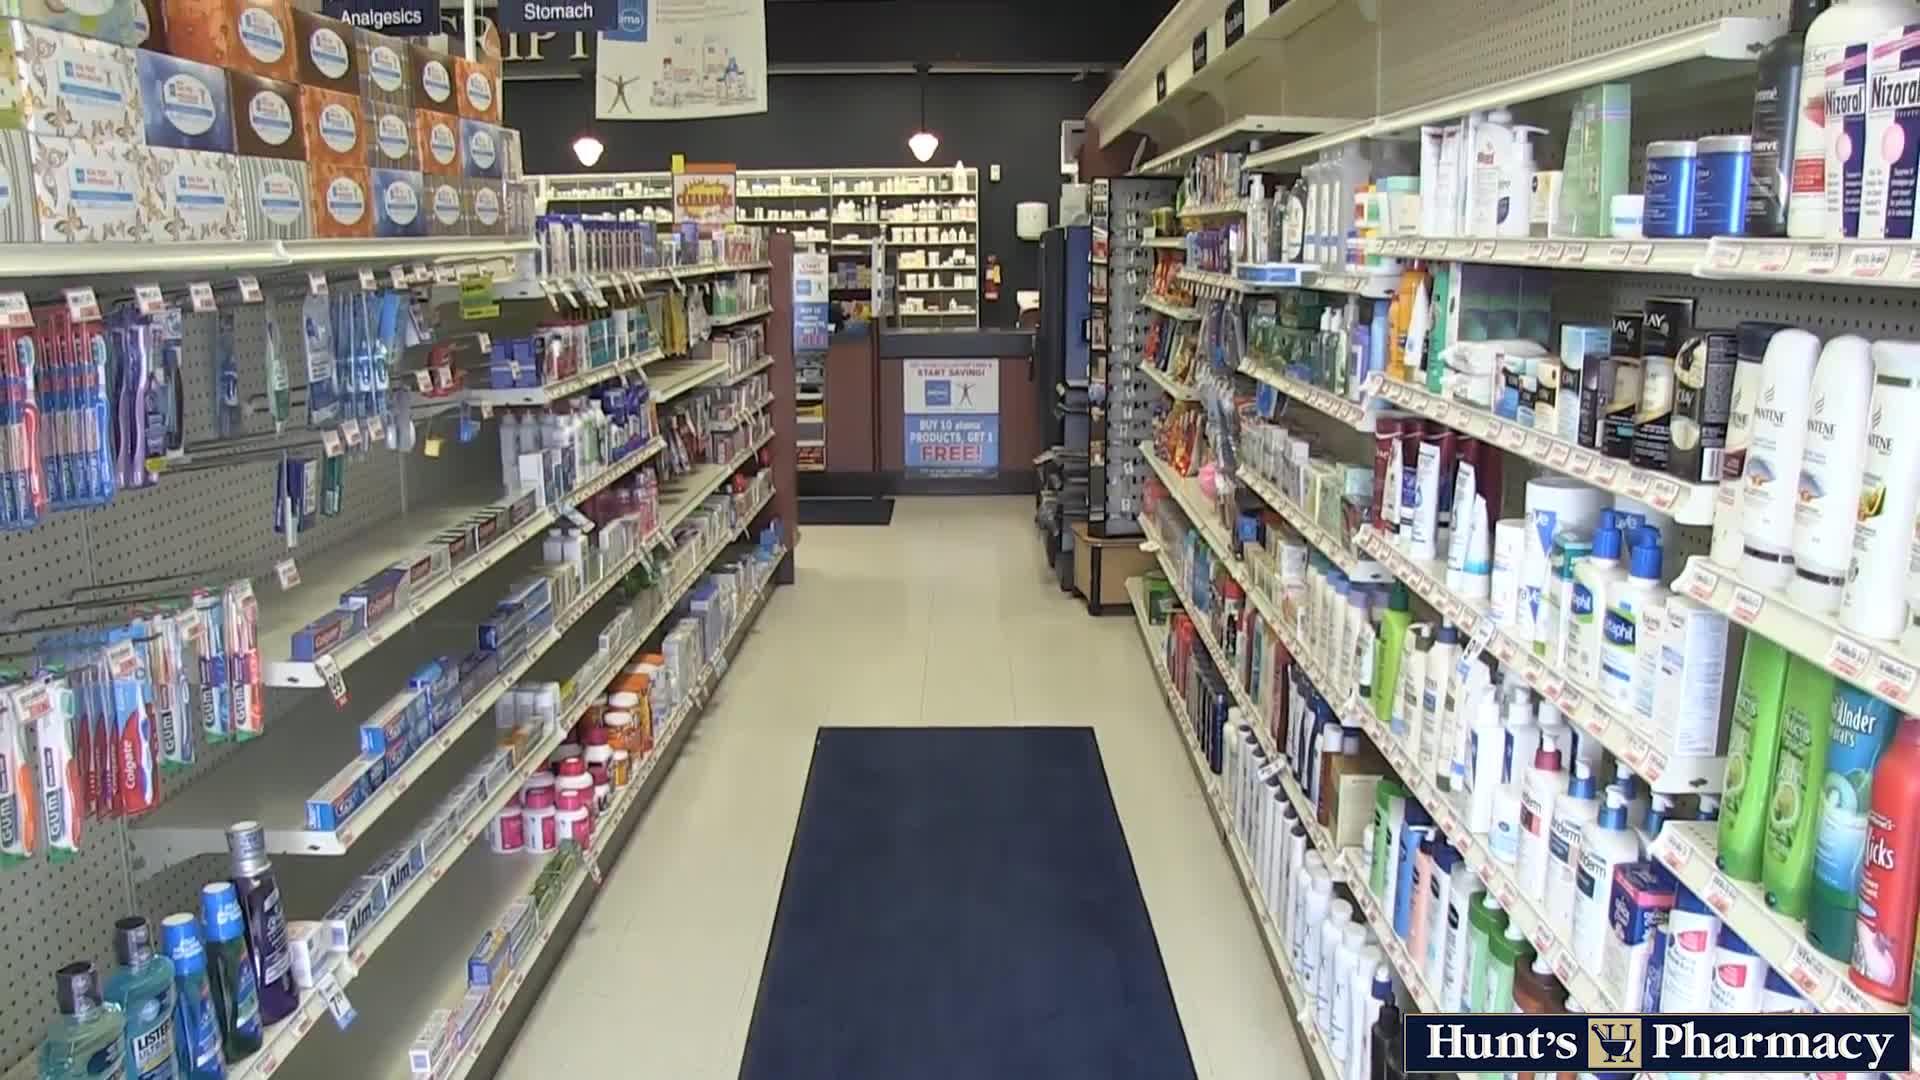 Hunt's Pharmacy - Pharmacies - 613-389-8800